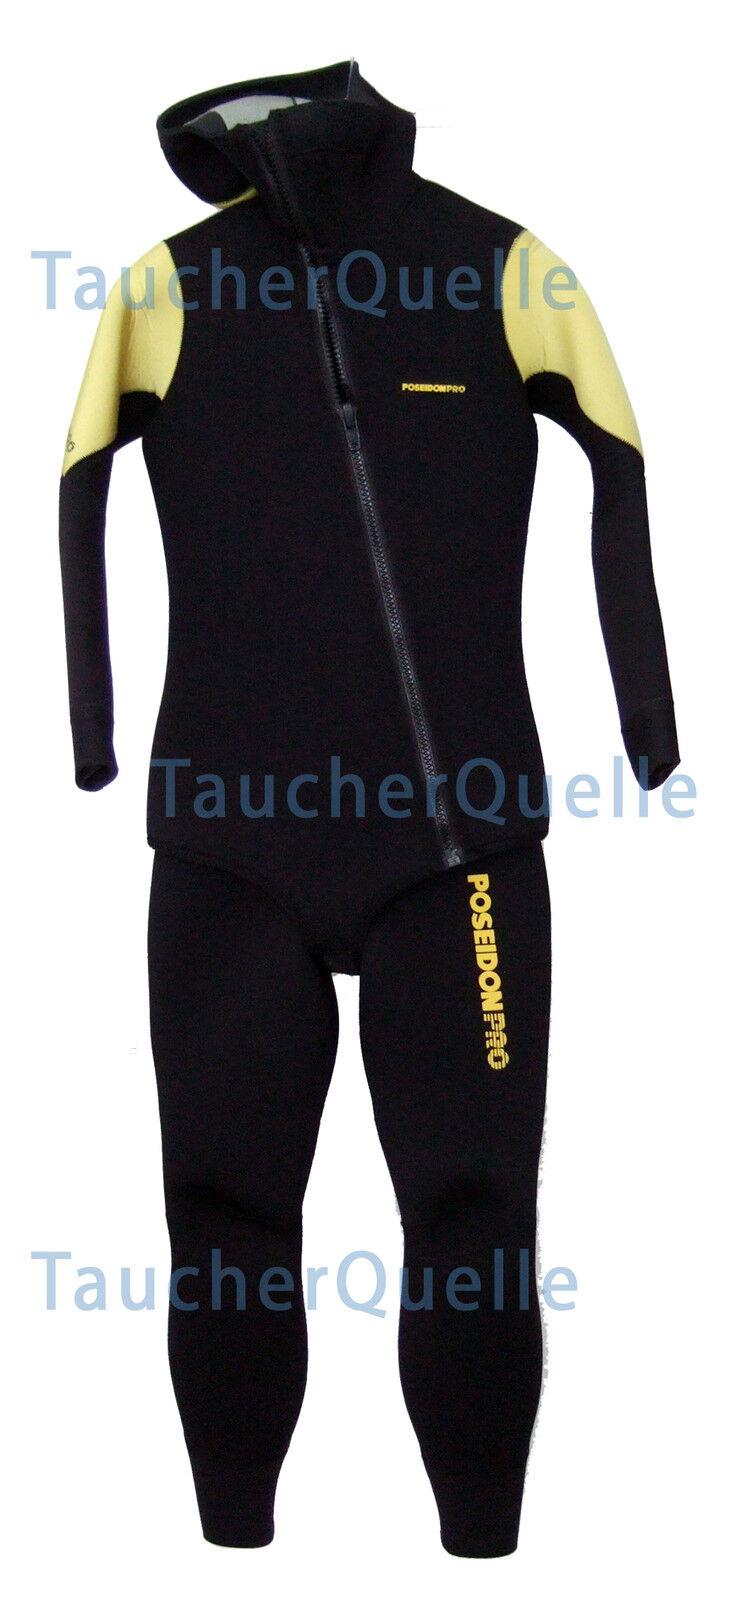 Poseidon Pro Dive Suit, Set 7mm - Long John and Ice Vest -männer- SPECIAL OFFER